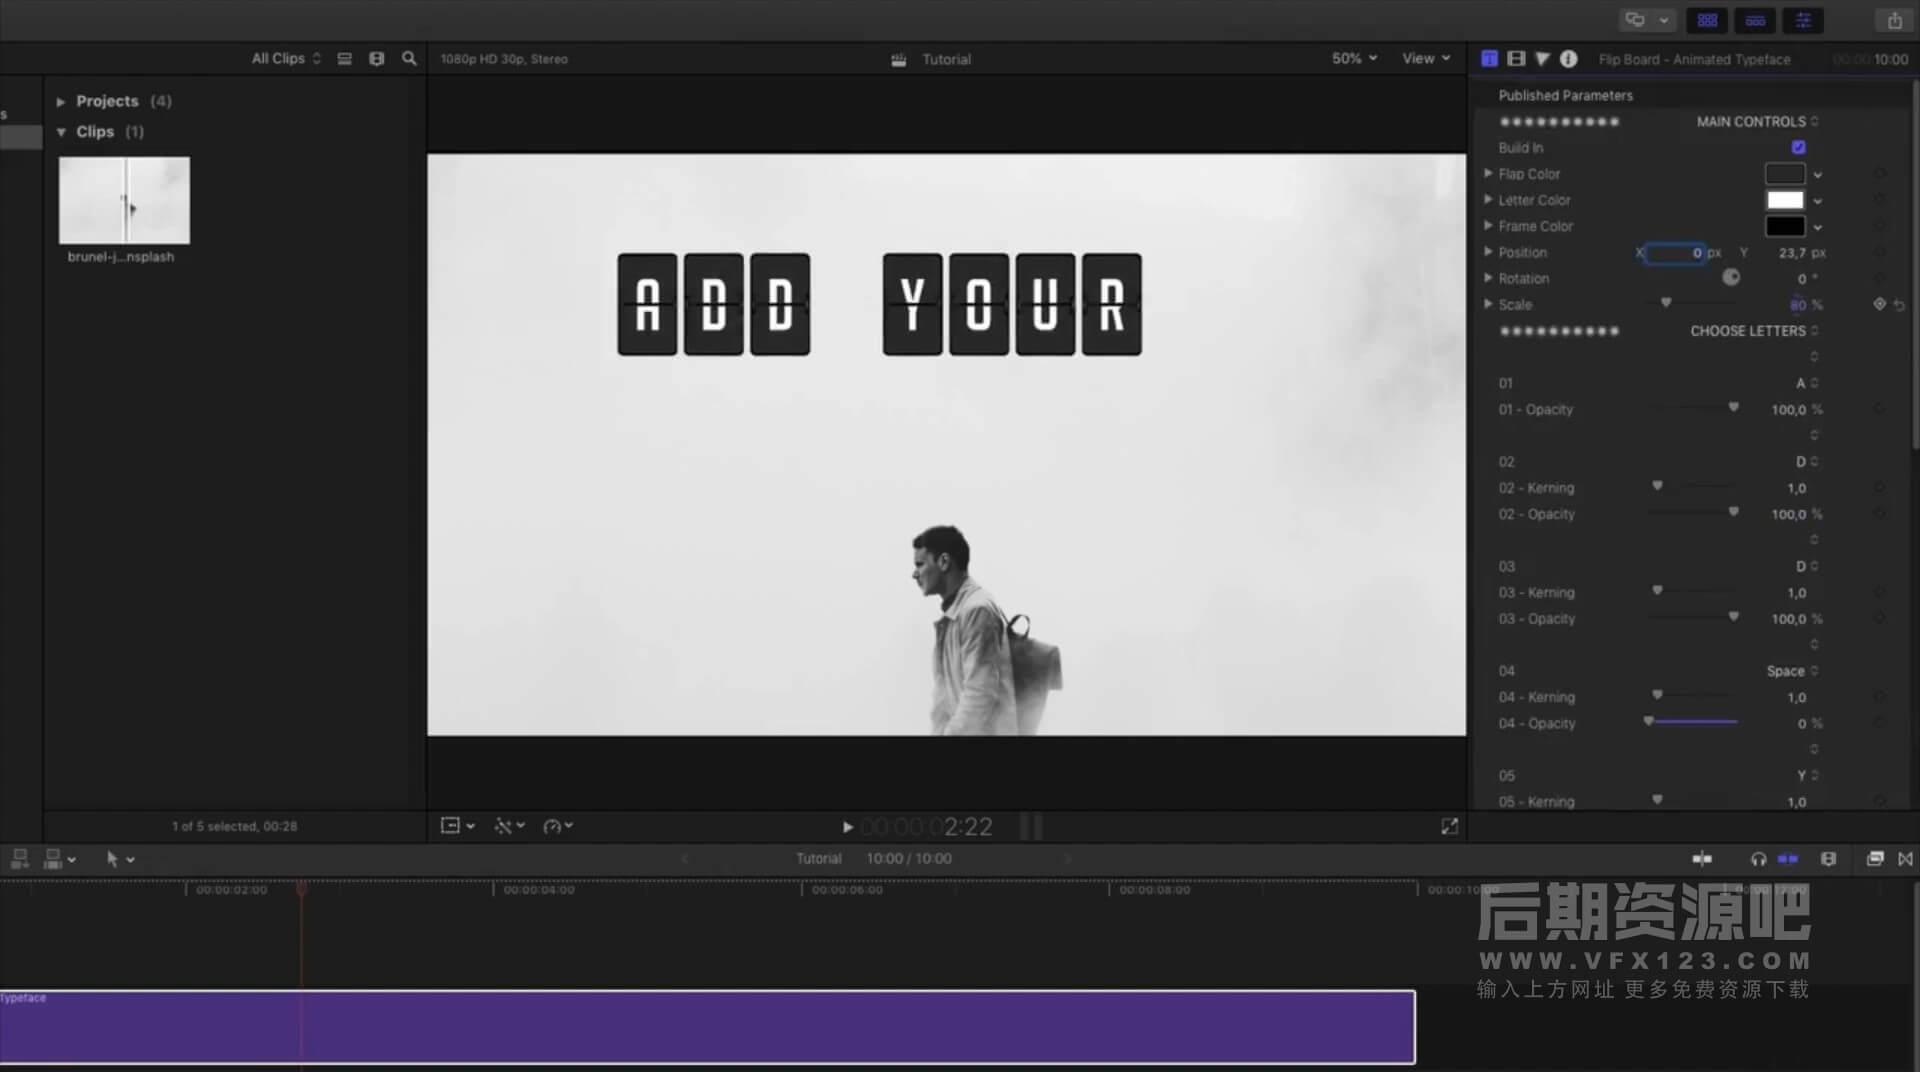 FCPX标题插件 15组字母文字翻页效果 Flip Board Animated